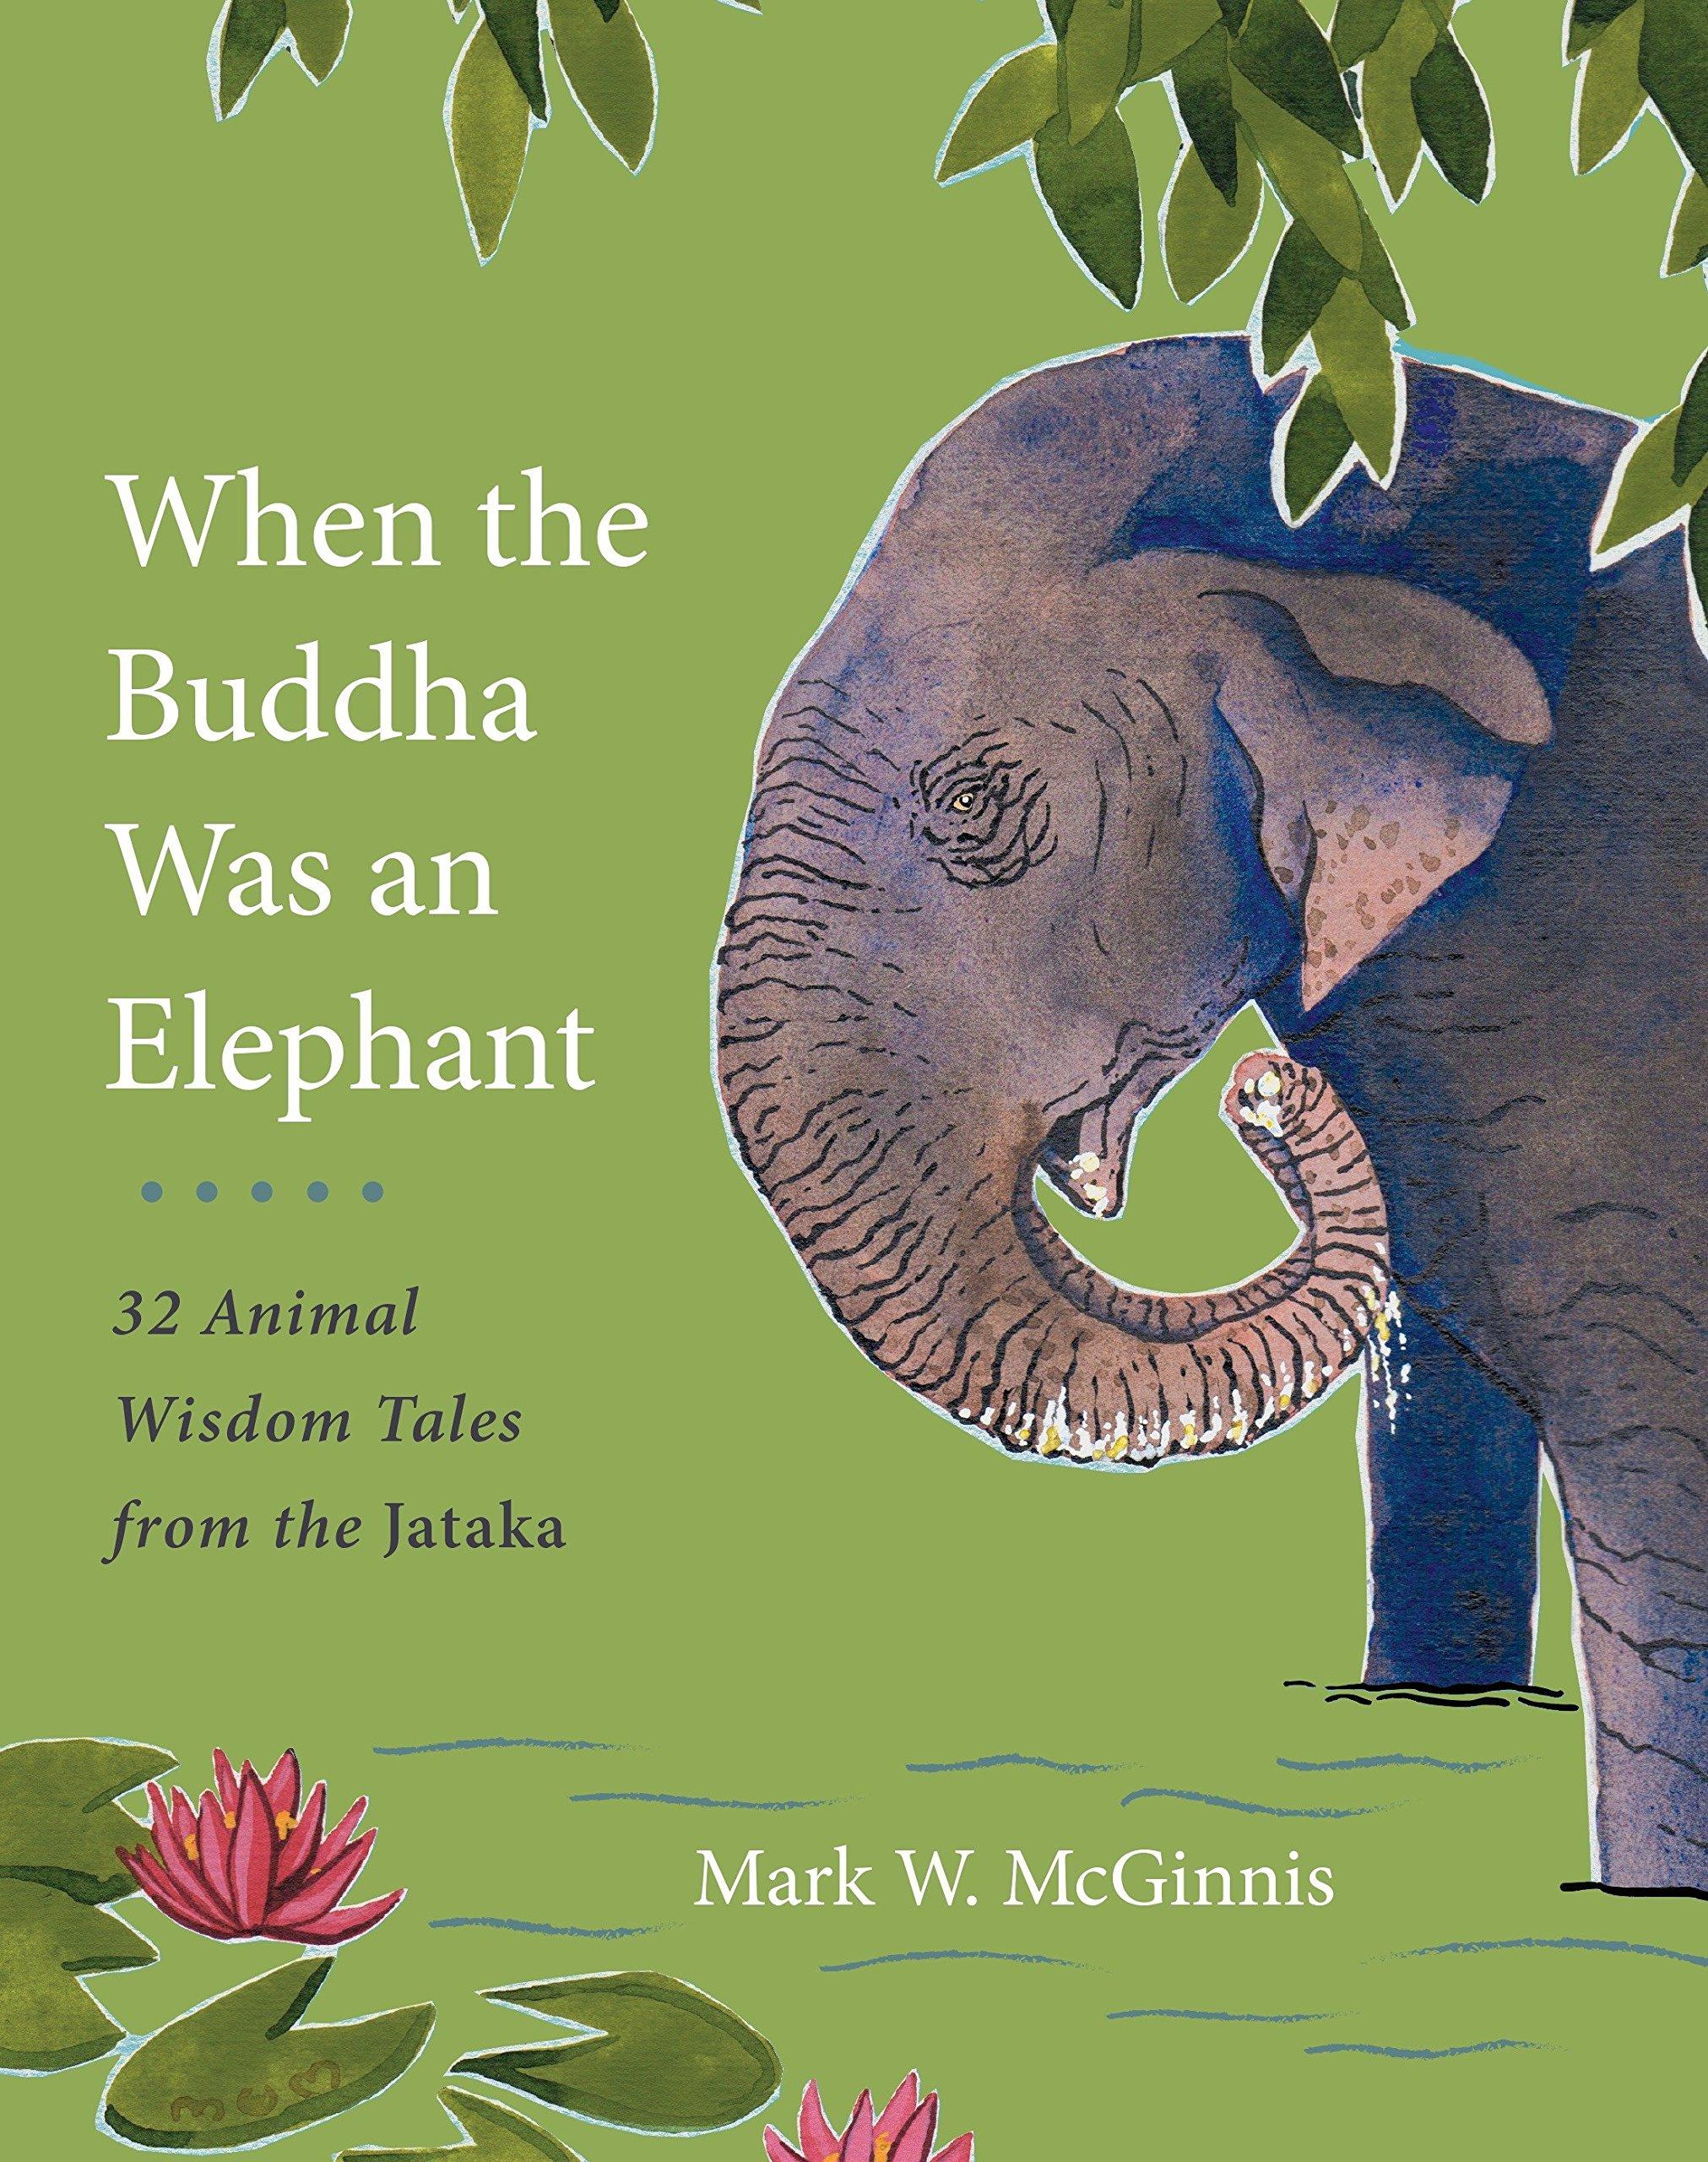 McGinnis Buddha Elephant cover art